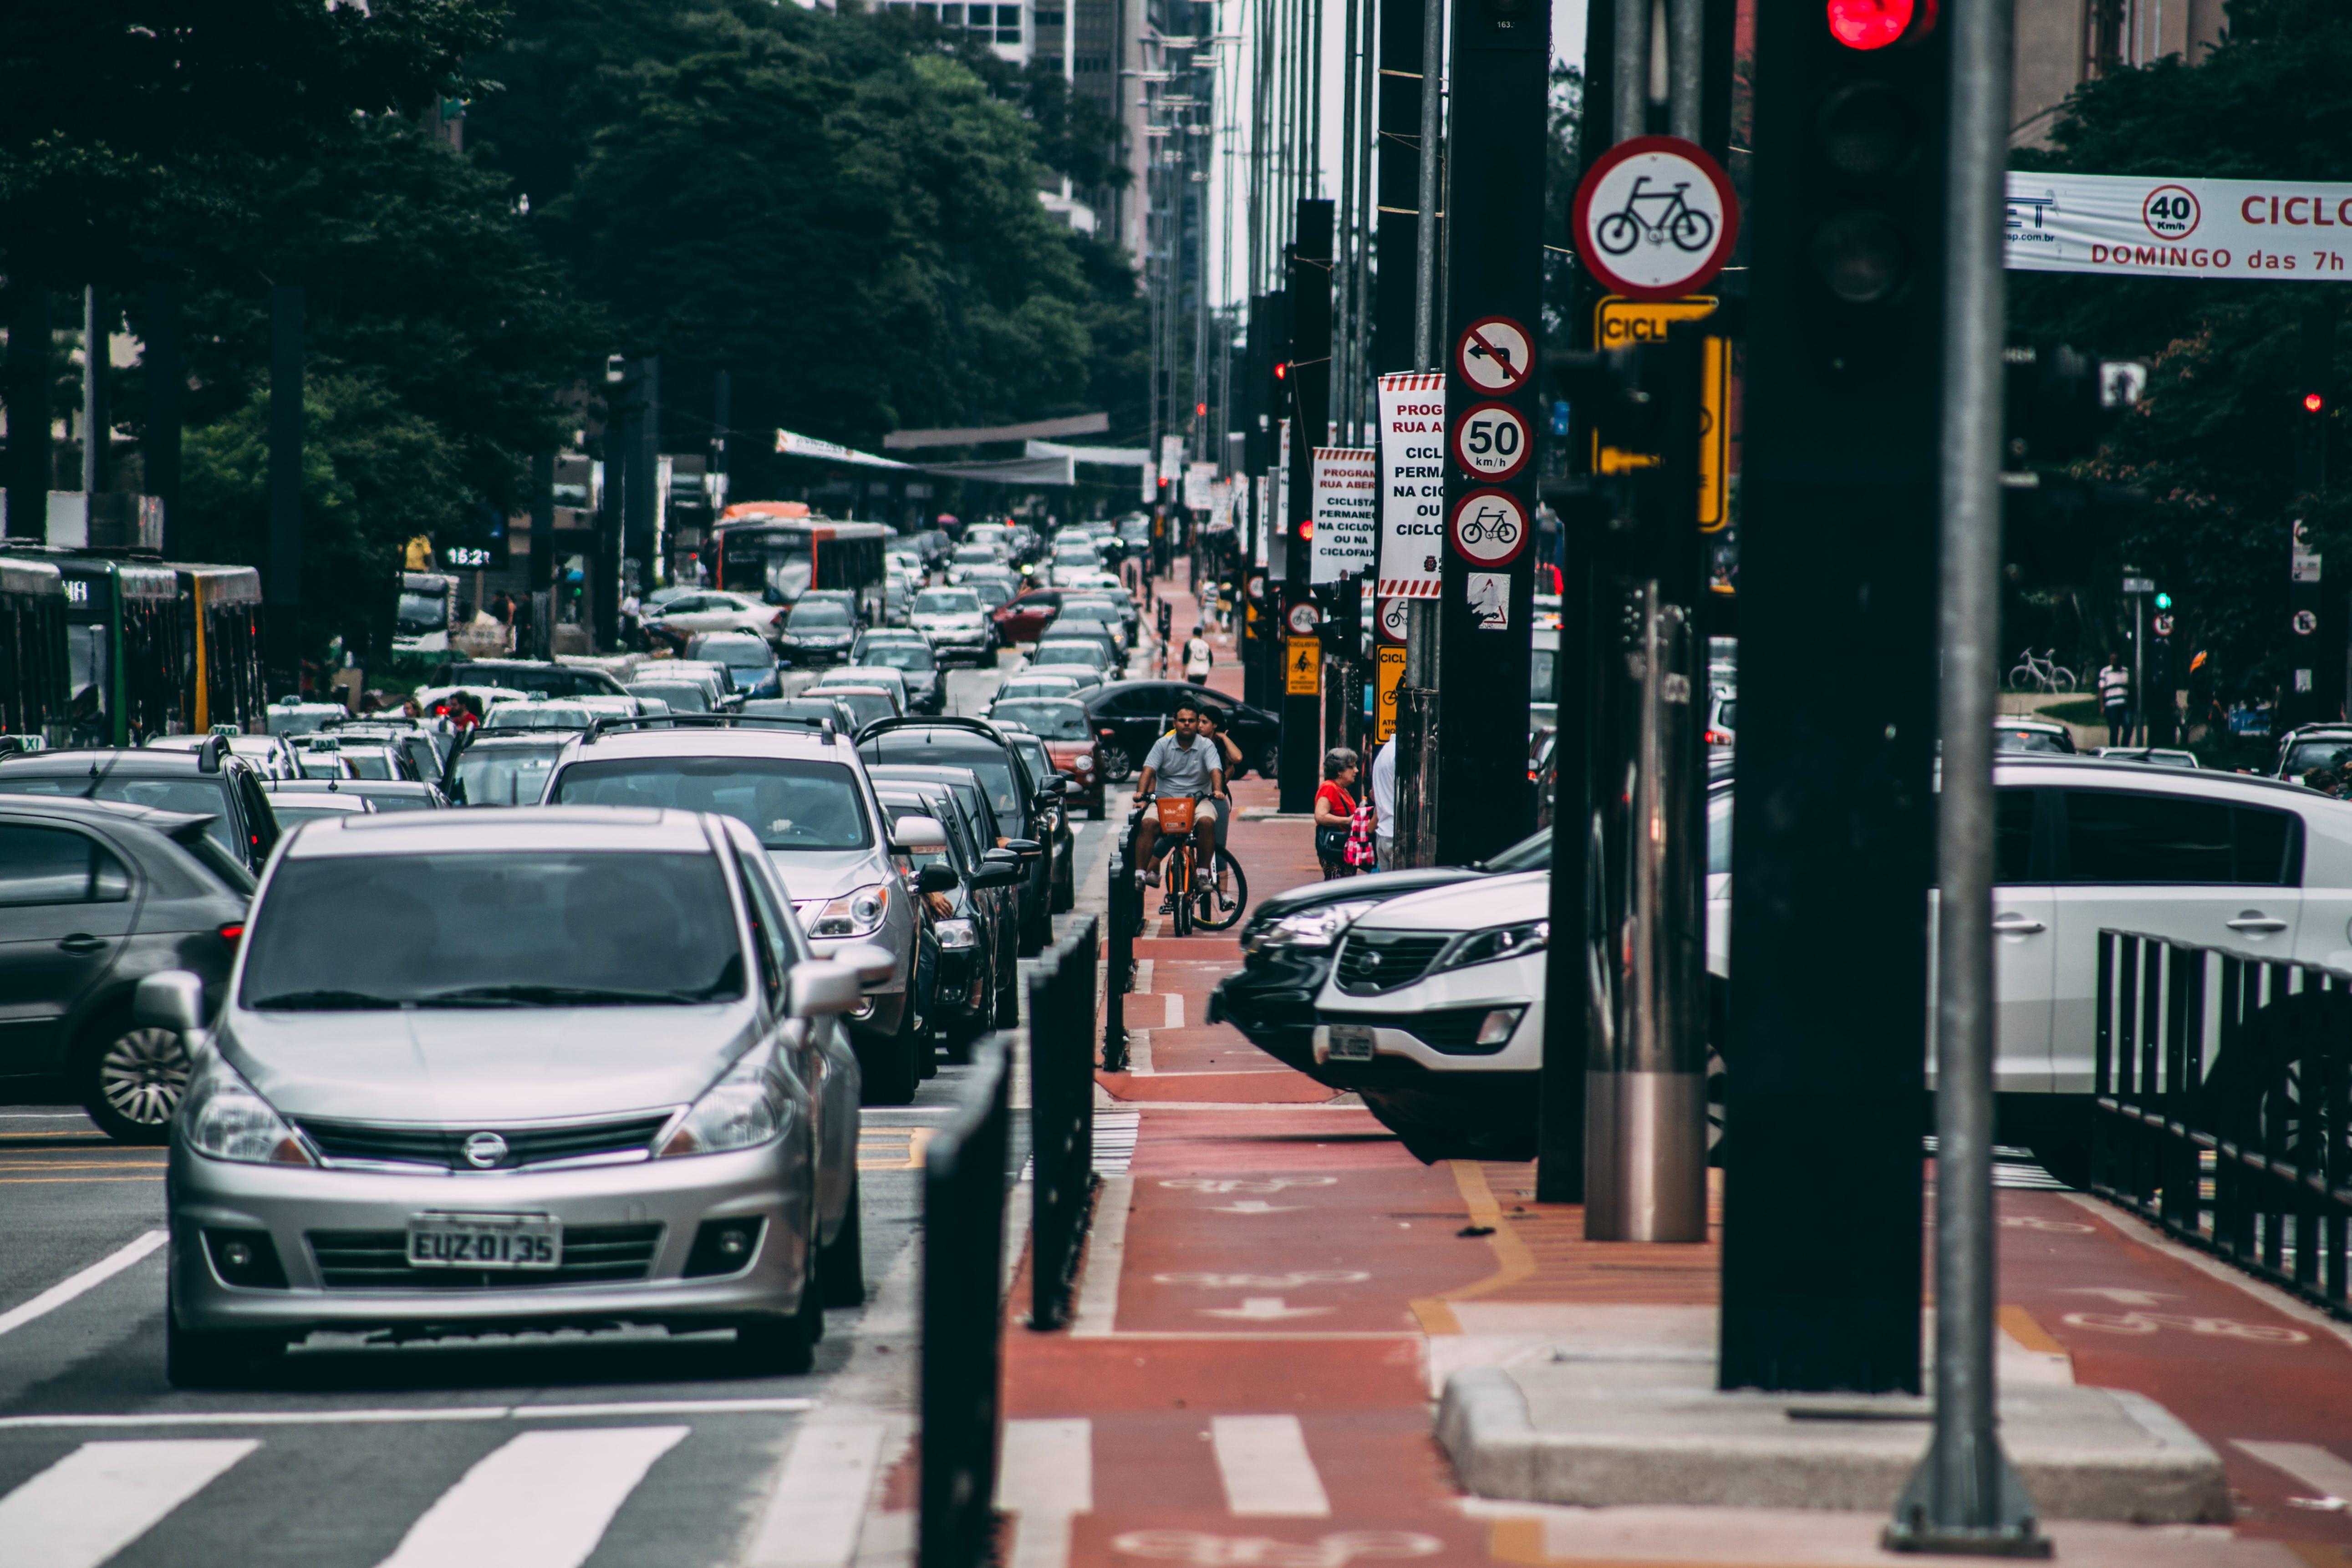 brasil, cars, city